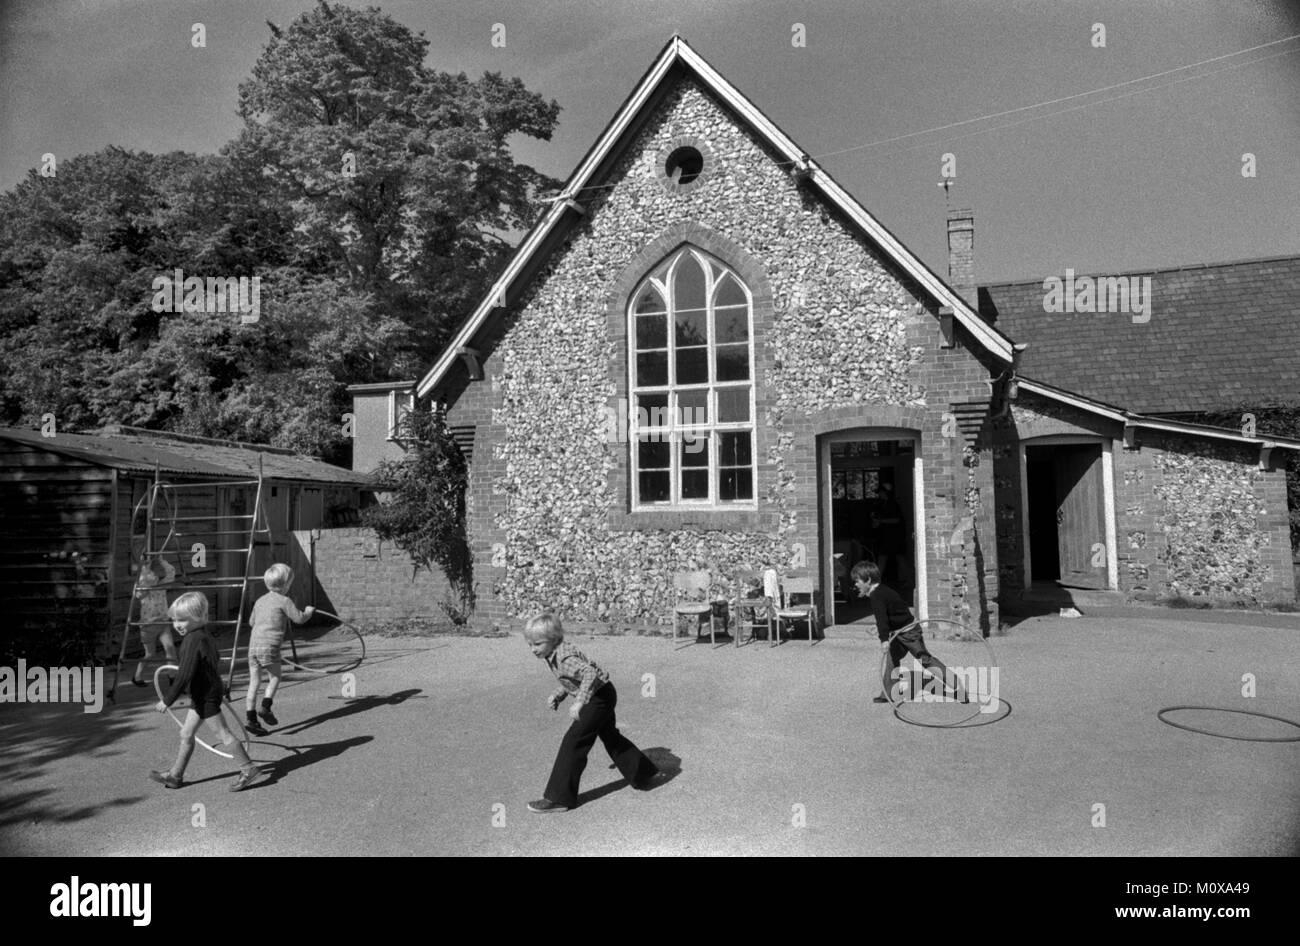 Dorf Grundschule 1970s England. Cheveley Cambridgeshire 1978 70 s UK HOMER SYKES Stockfoto